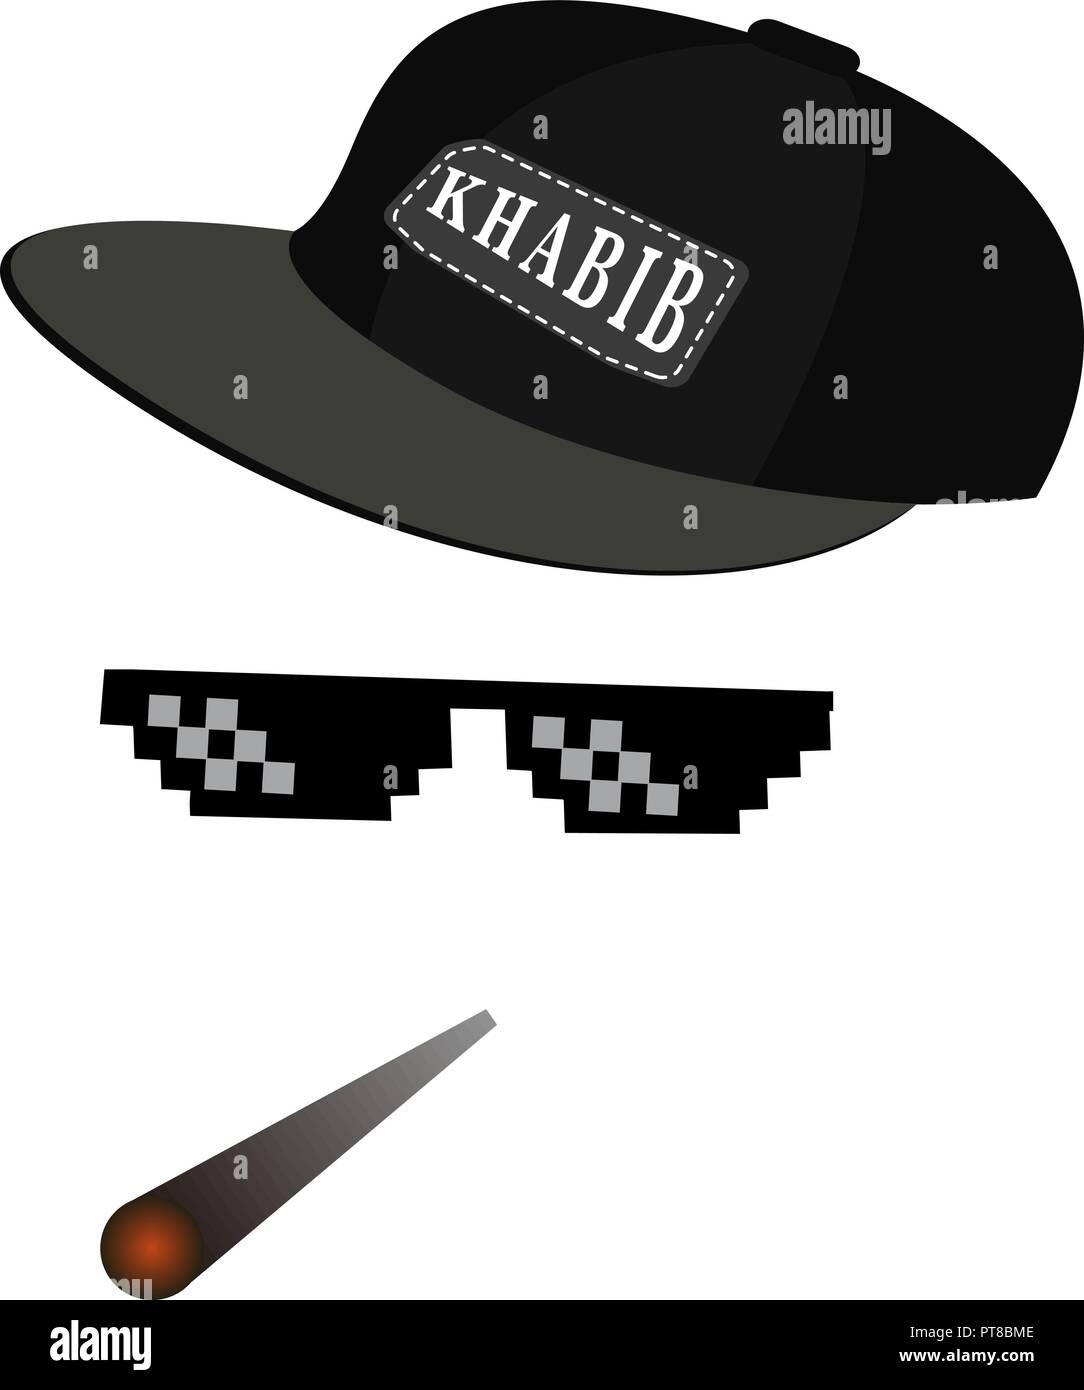 b357a549b5a glasses pixel vector icon. Pixel Art Glasses of Thug Life Meme and smoke  with cap Habib Nurmagomedov. Vector eps 10